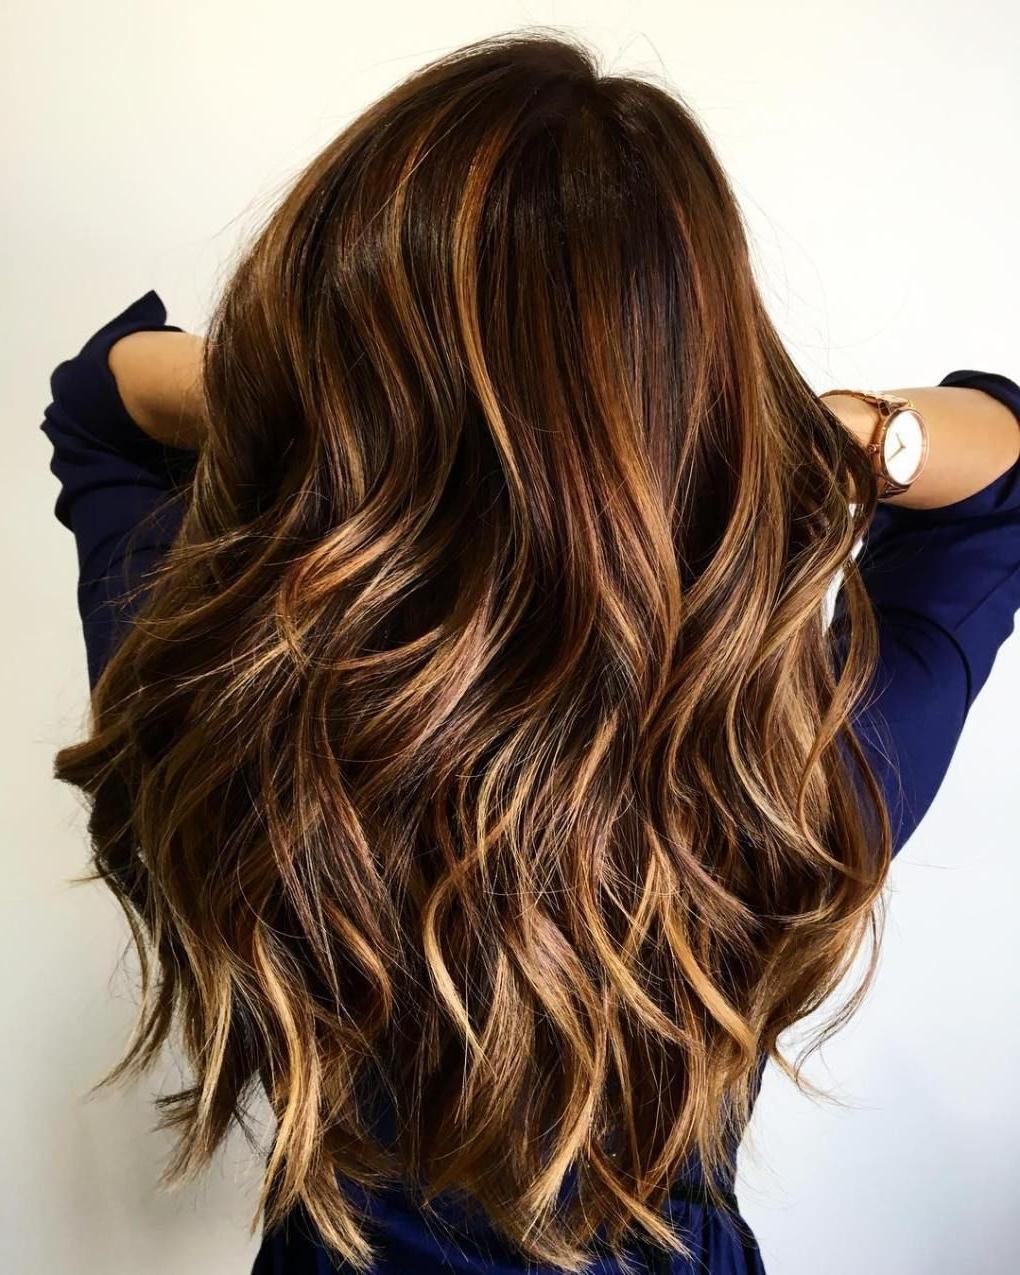 15 Yummiest Caramel Brown Hair Color Ideas